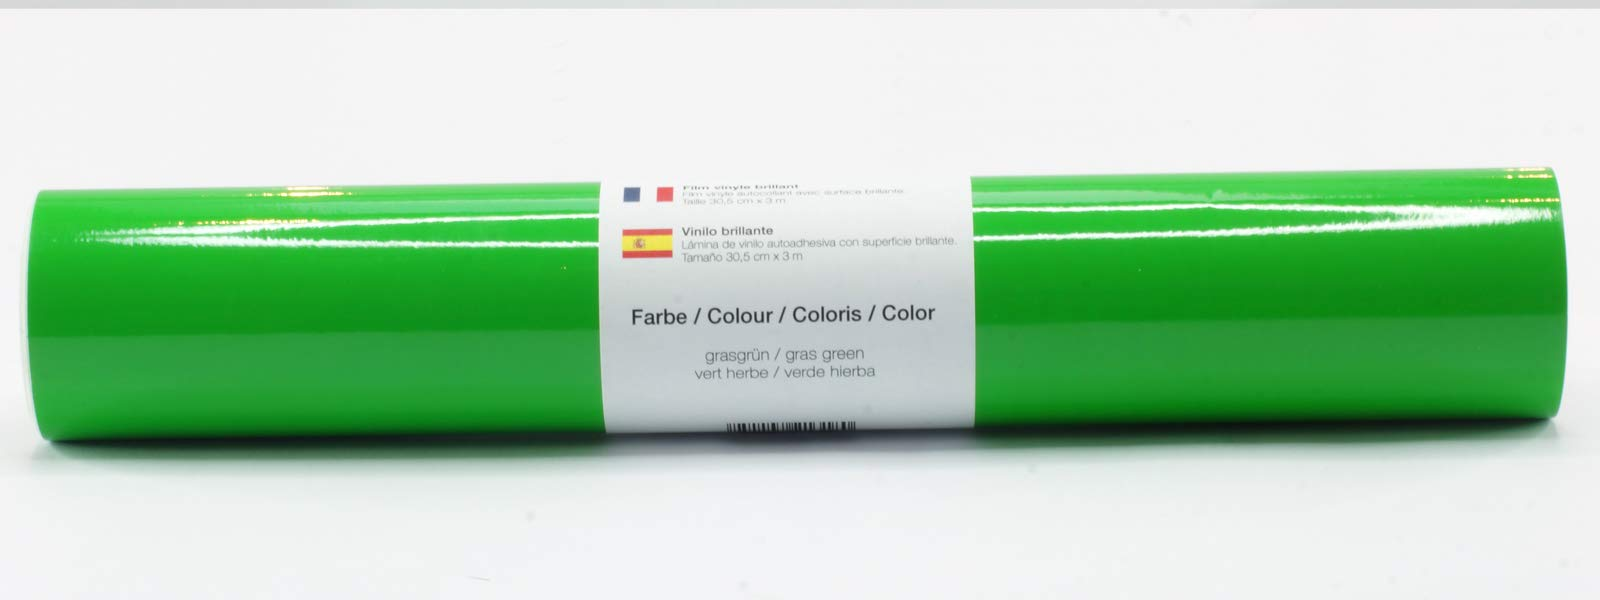 Lámina de plotter autoadhesiva lámina de vinilo 21 cm x 3 m brillo 39 colores a elegir, Glänzend L-Serie:Verde Hierba: Amazon.es: Hogar